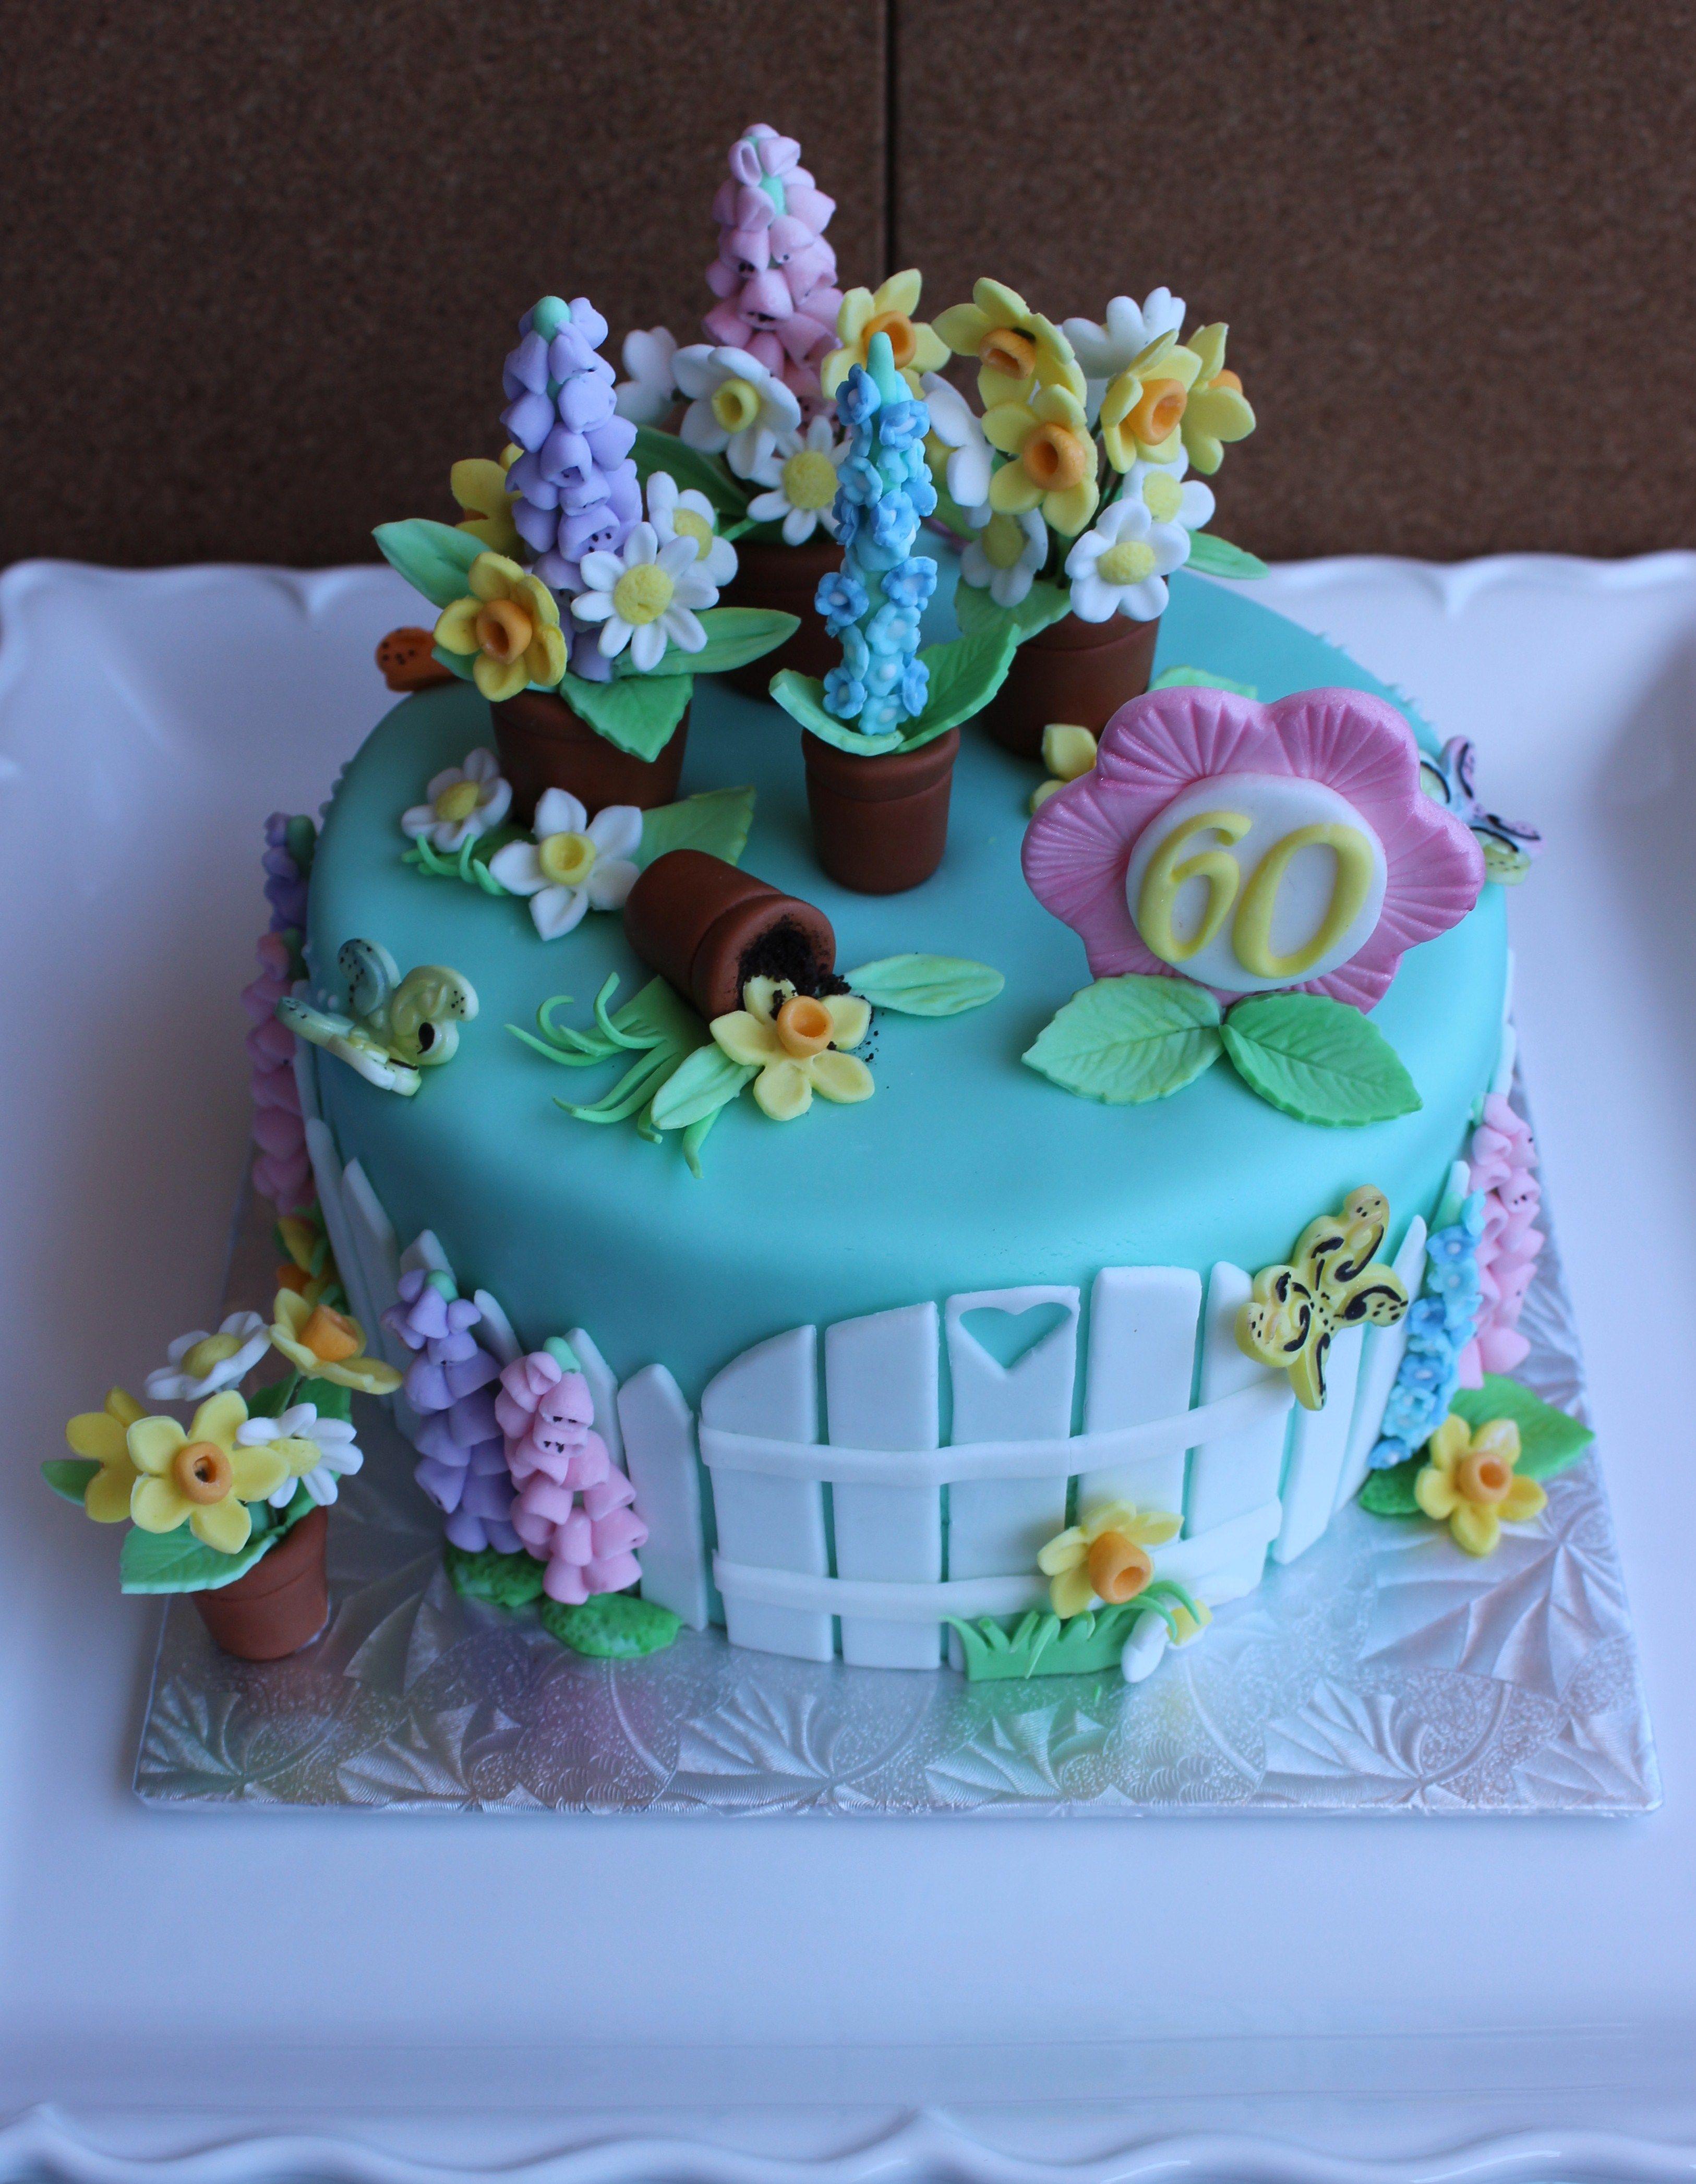 A lovely spring cake a happy birthday spring flower cake